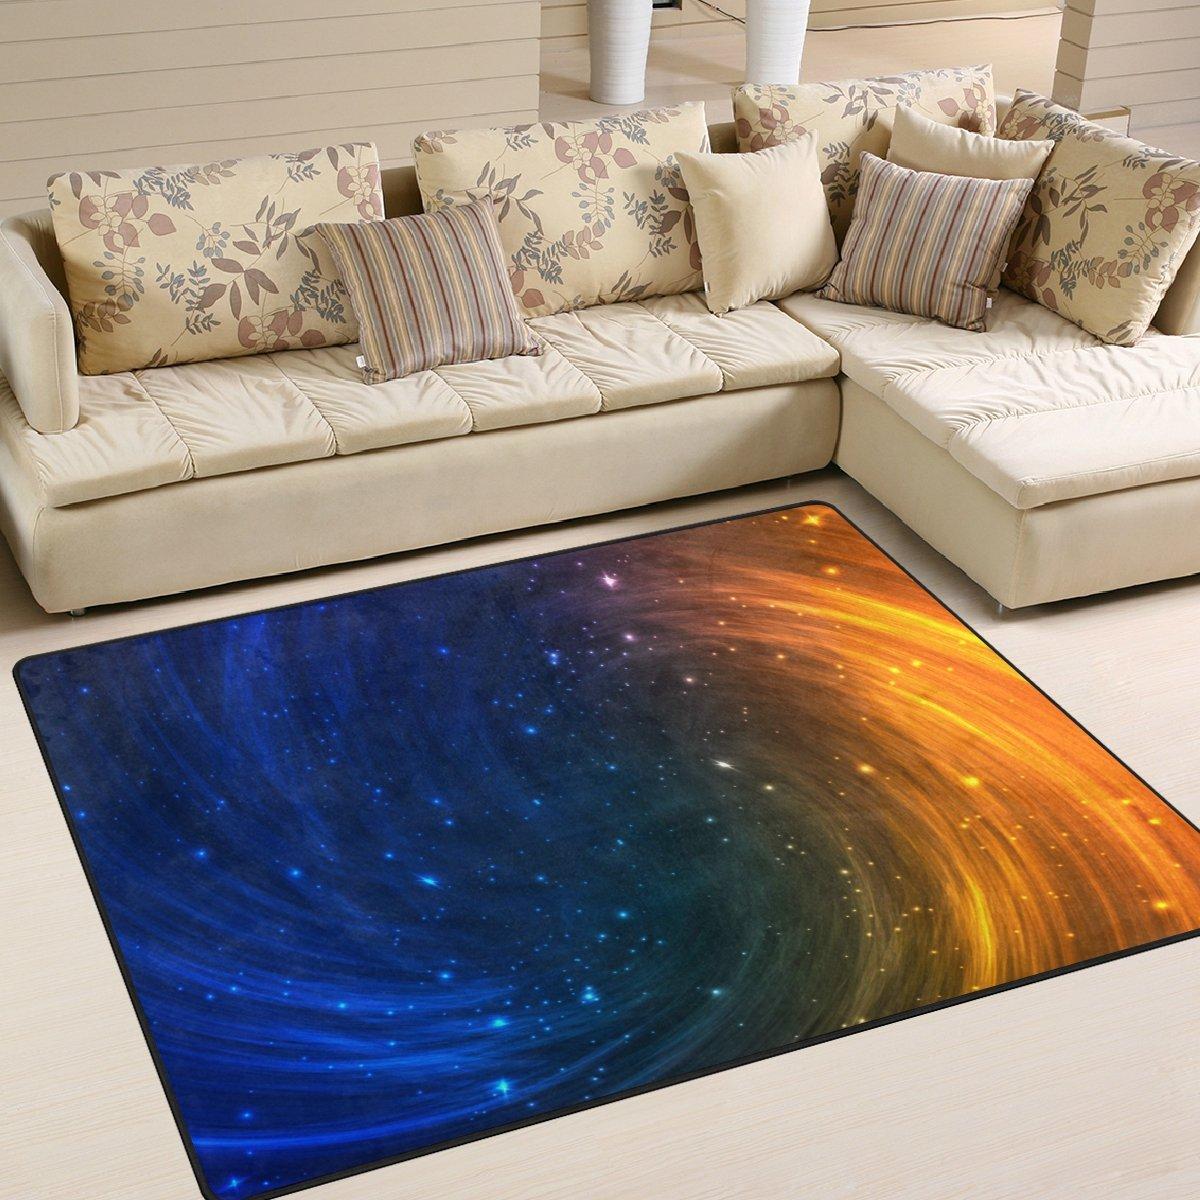 Aideess Triangulum Galaxy Outer Space Area Rugs for Living Room Bedroom 7'x5', Kids Children Carpet Rug Non-Slip Floor Mat Resting Area Doormats